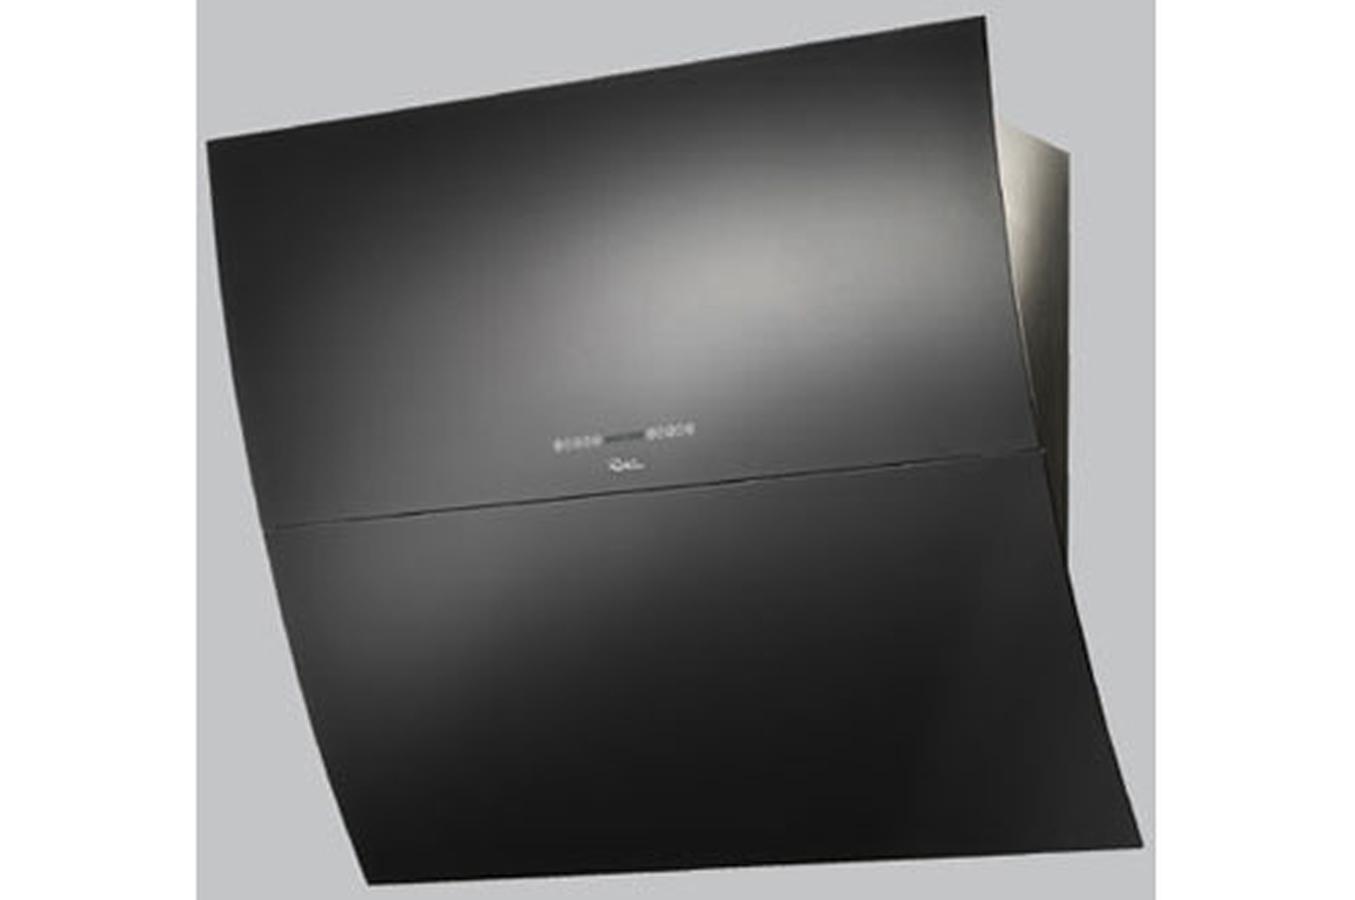 hotte d corative murale roblin ombre noire 900 2743582 darty. Black Bedroom Furniture Sets. Home Design Ideas